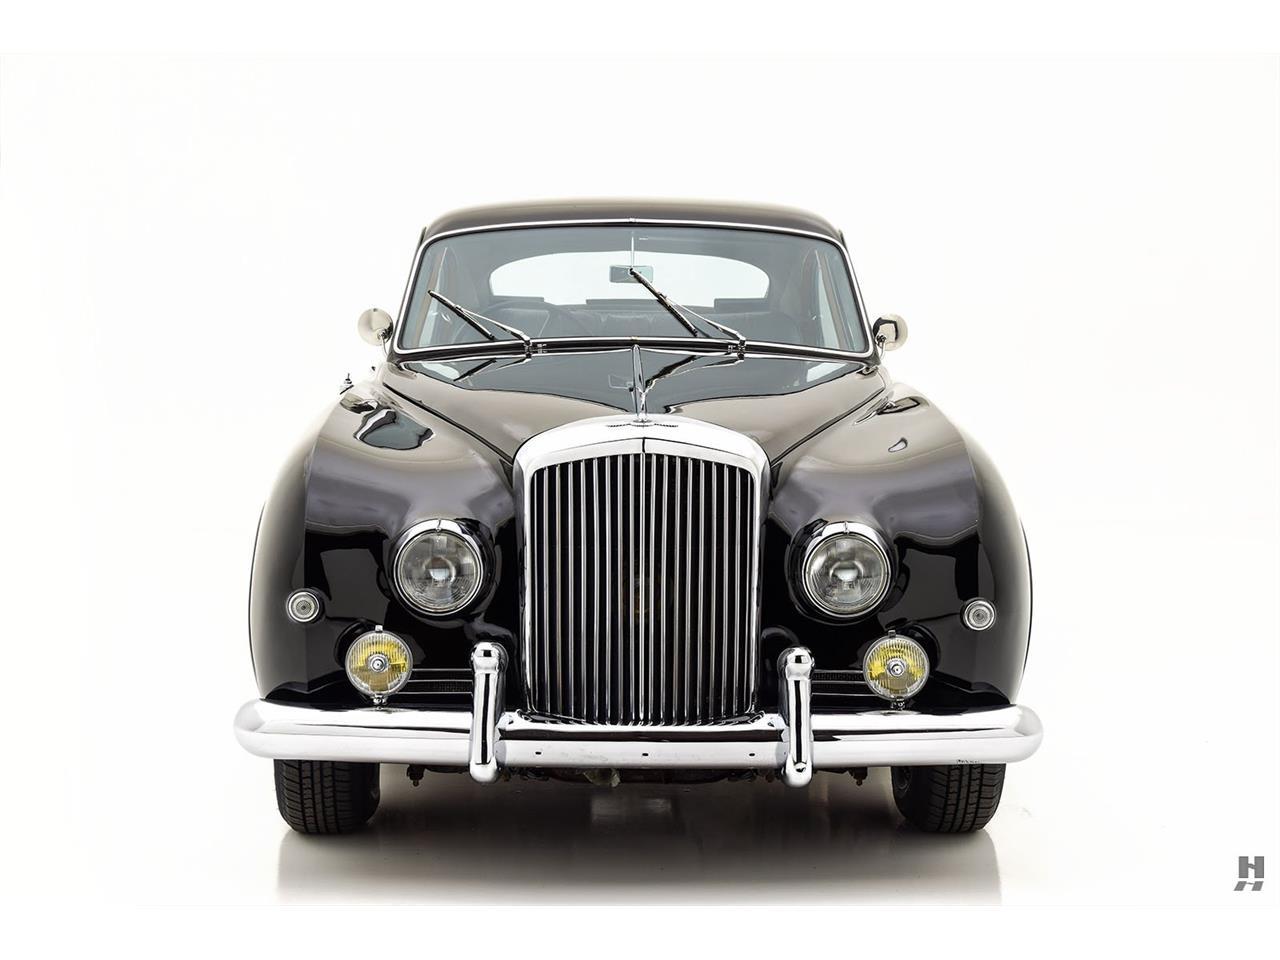 Large Picture of Classic '56 S1 located in Missouri - $479,500.00 - Q538